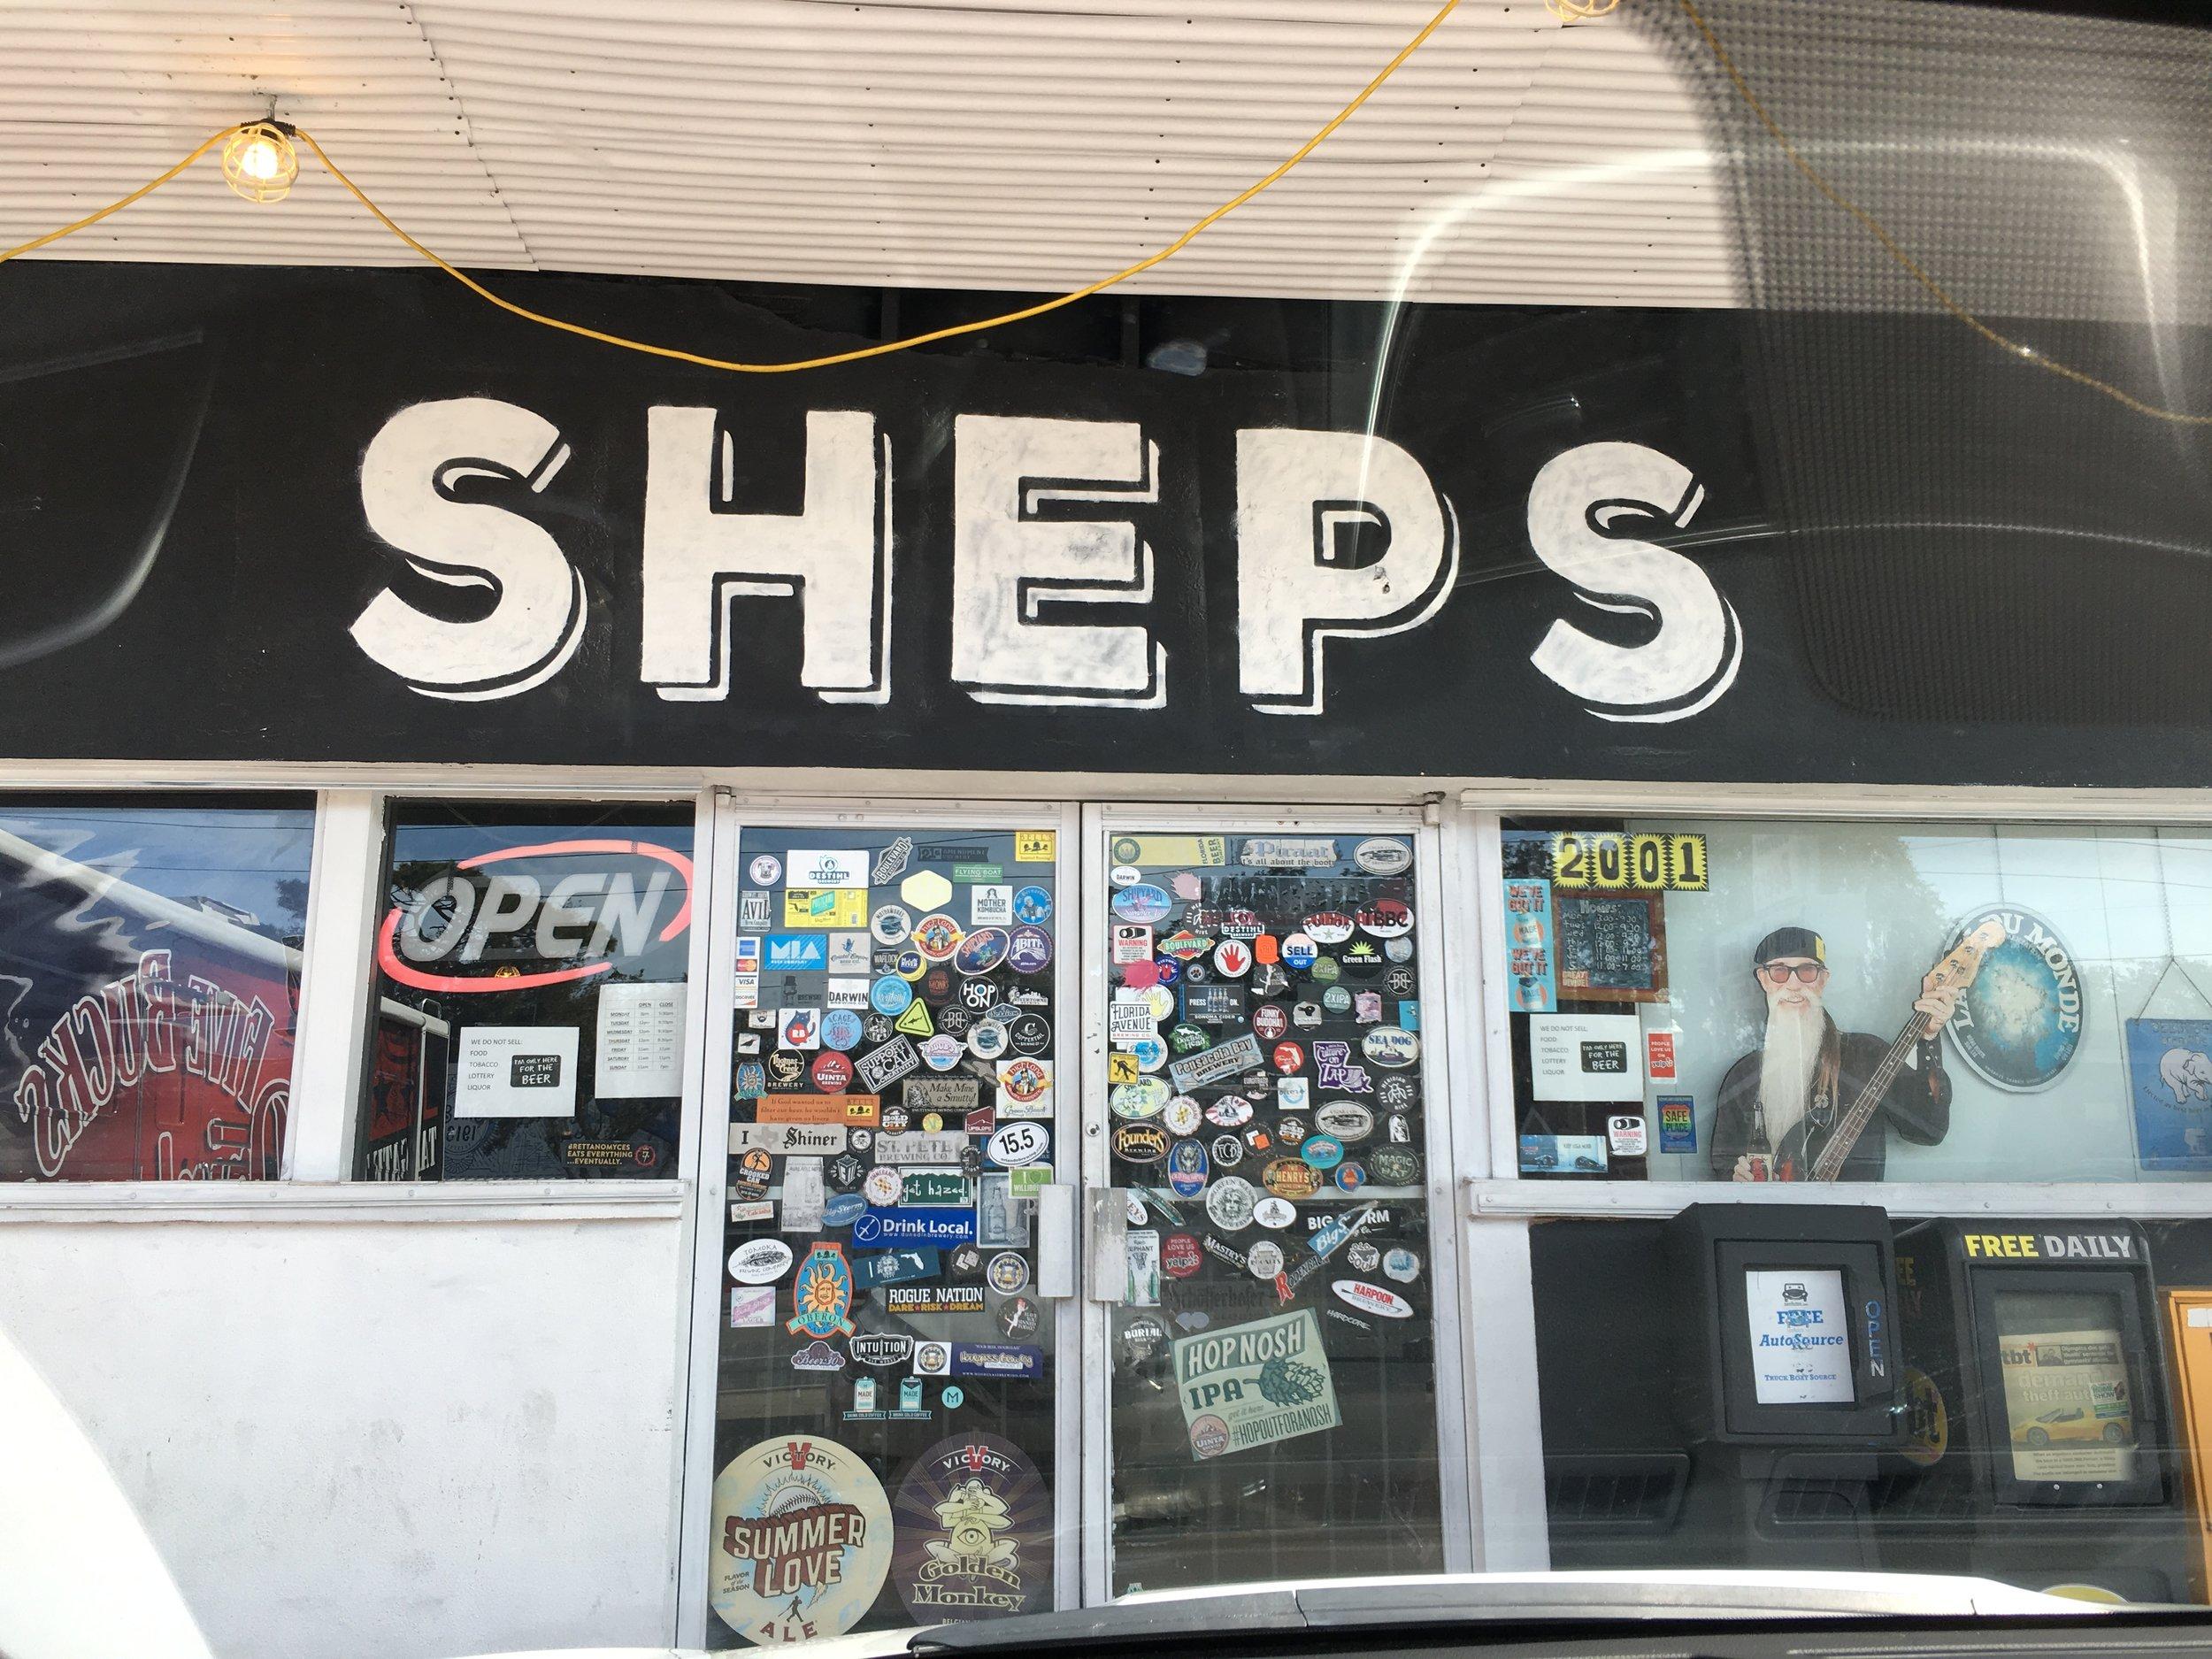 SHEPS